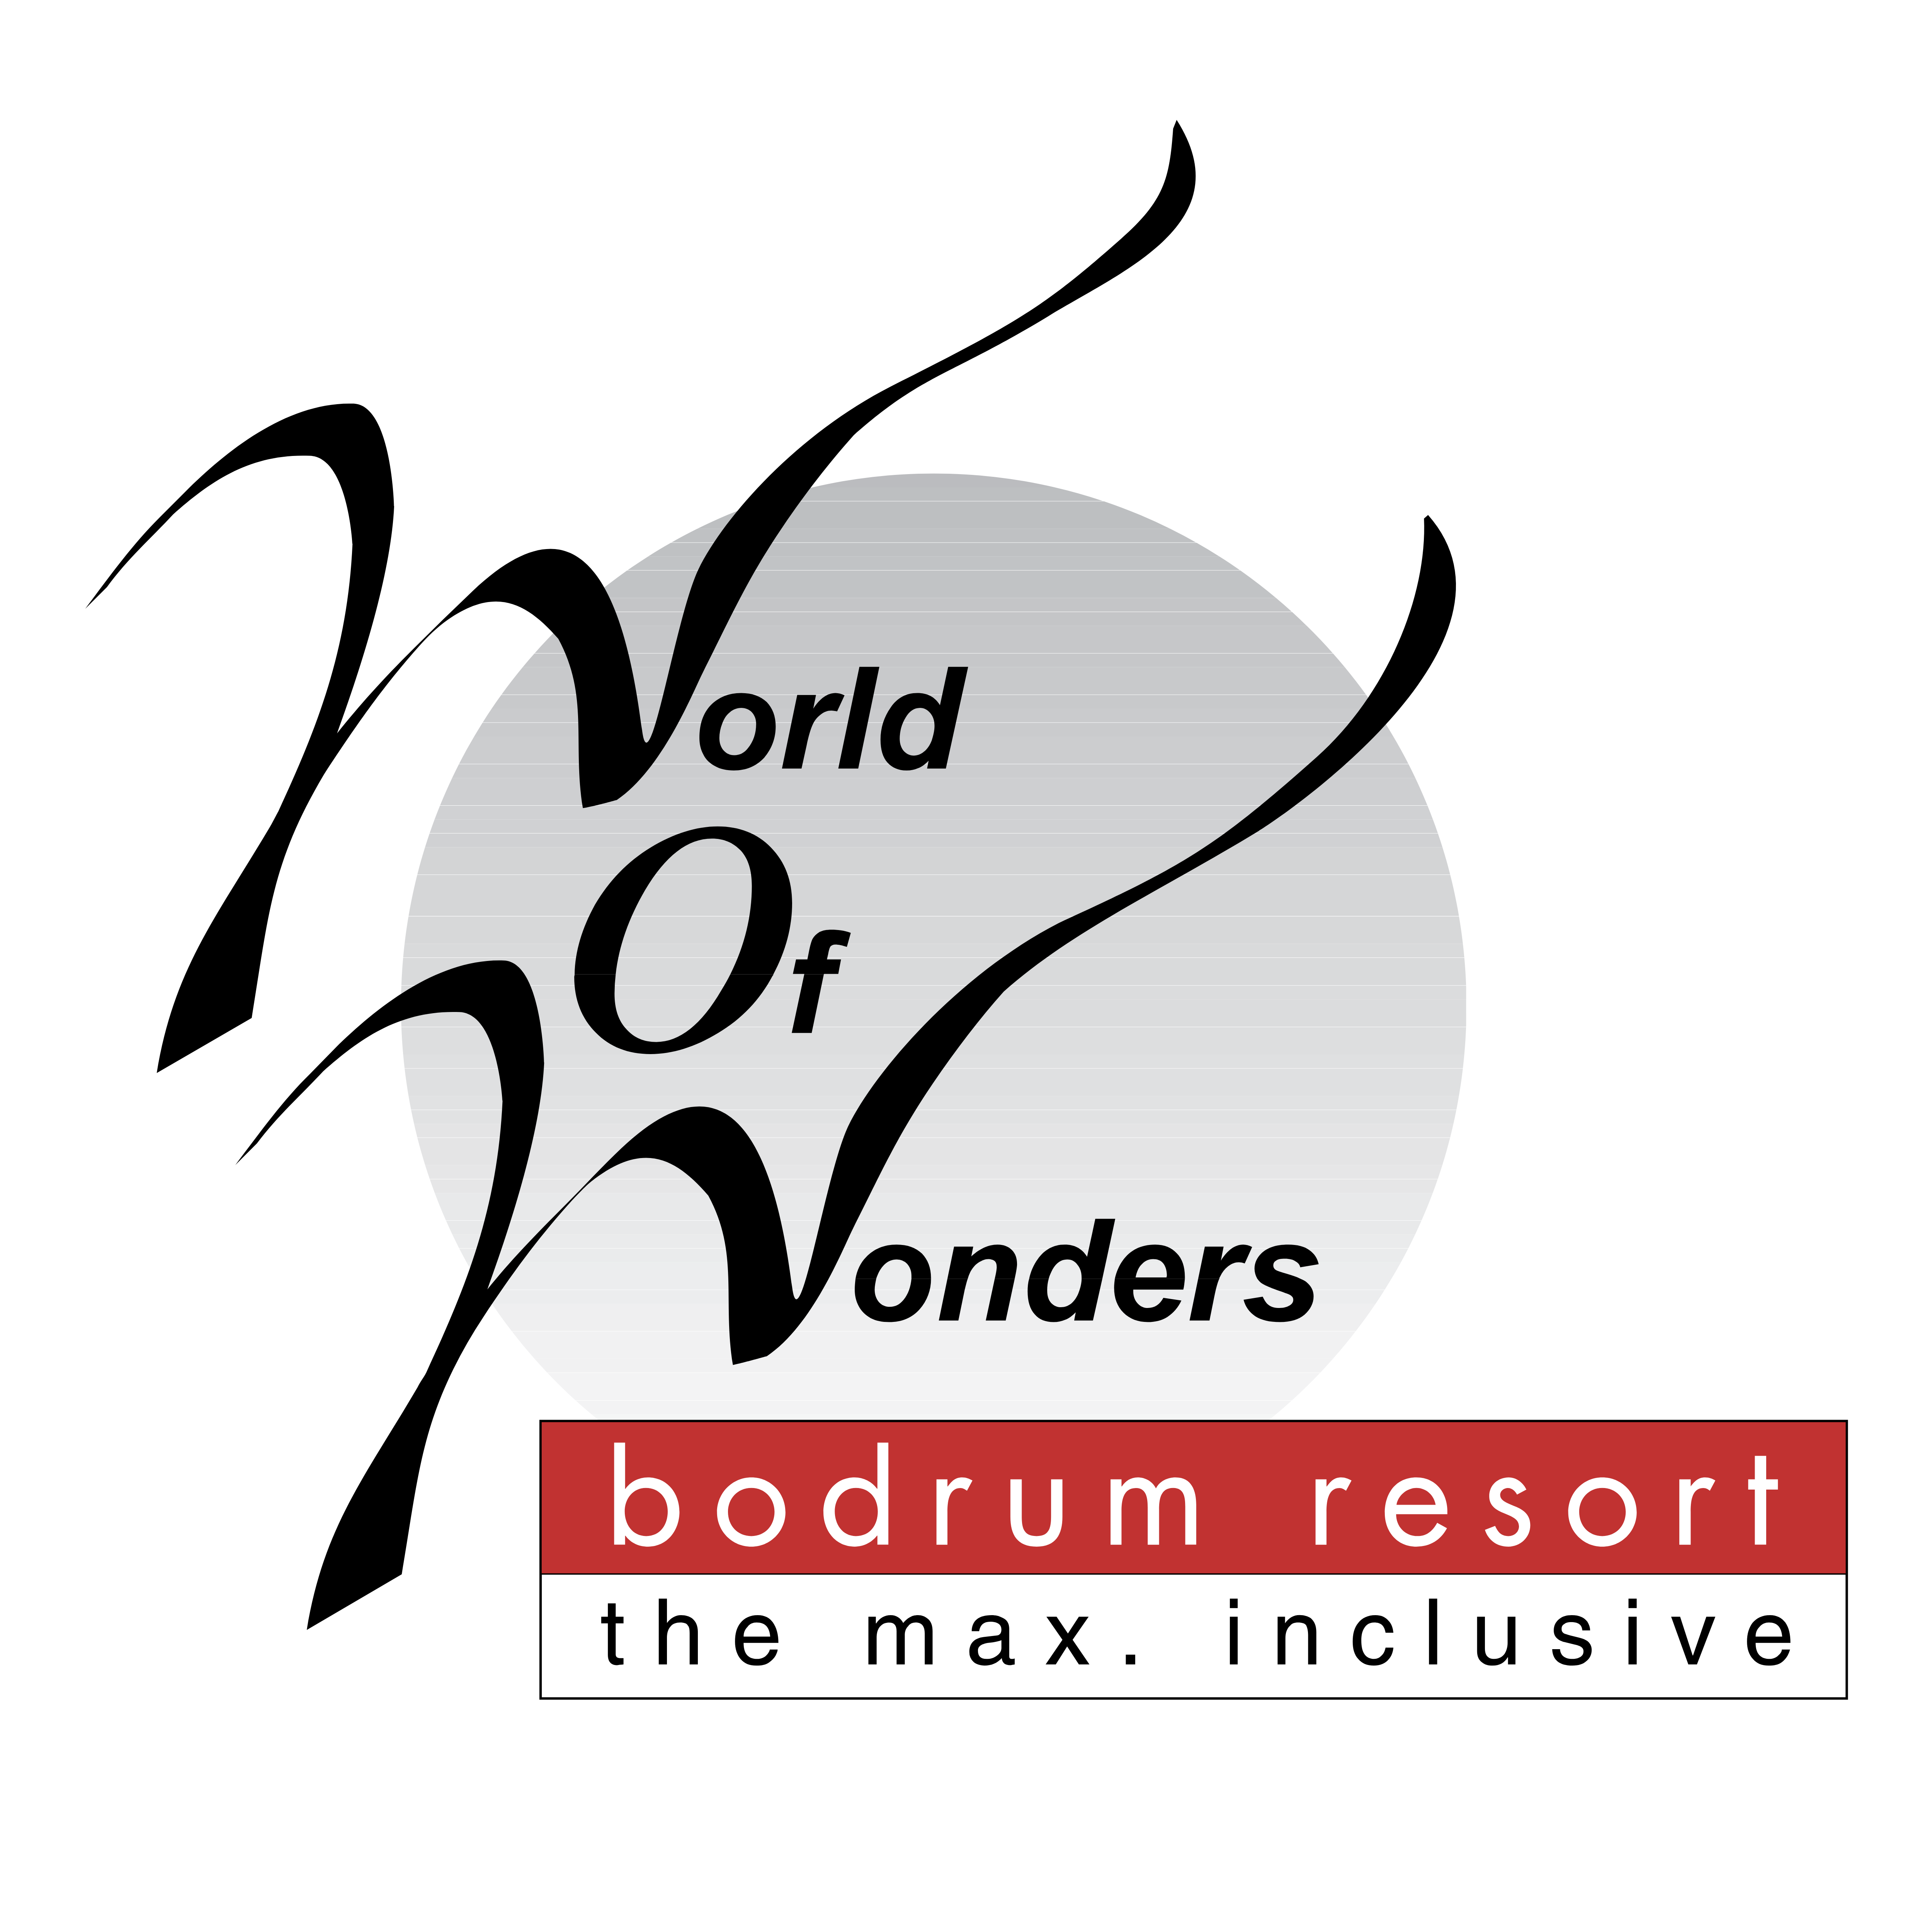 bodrum resort � logos download